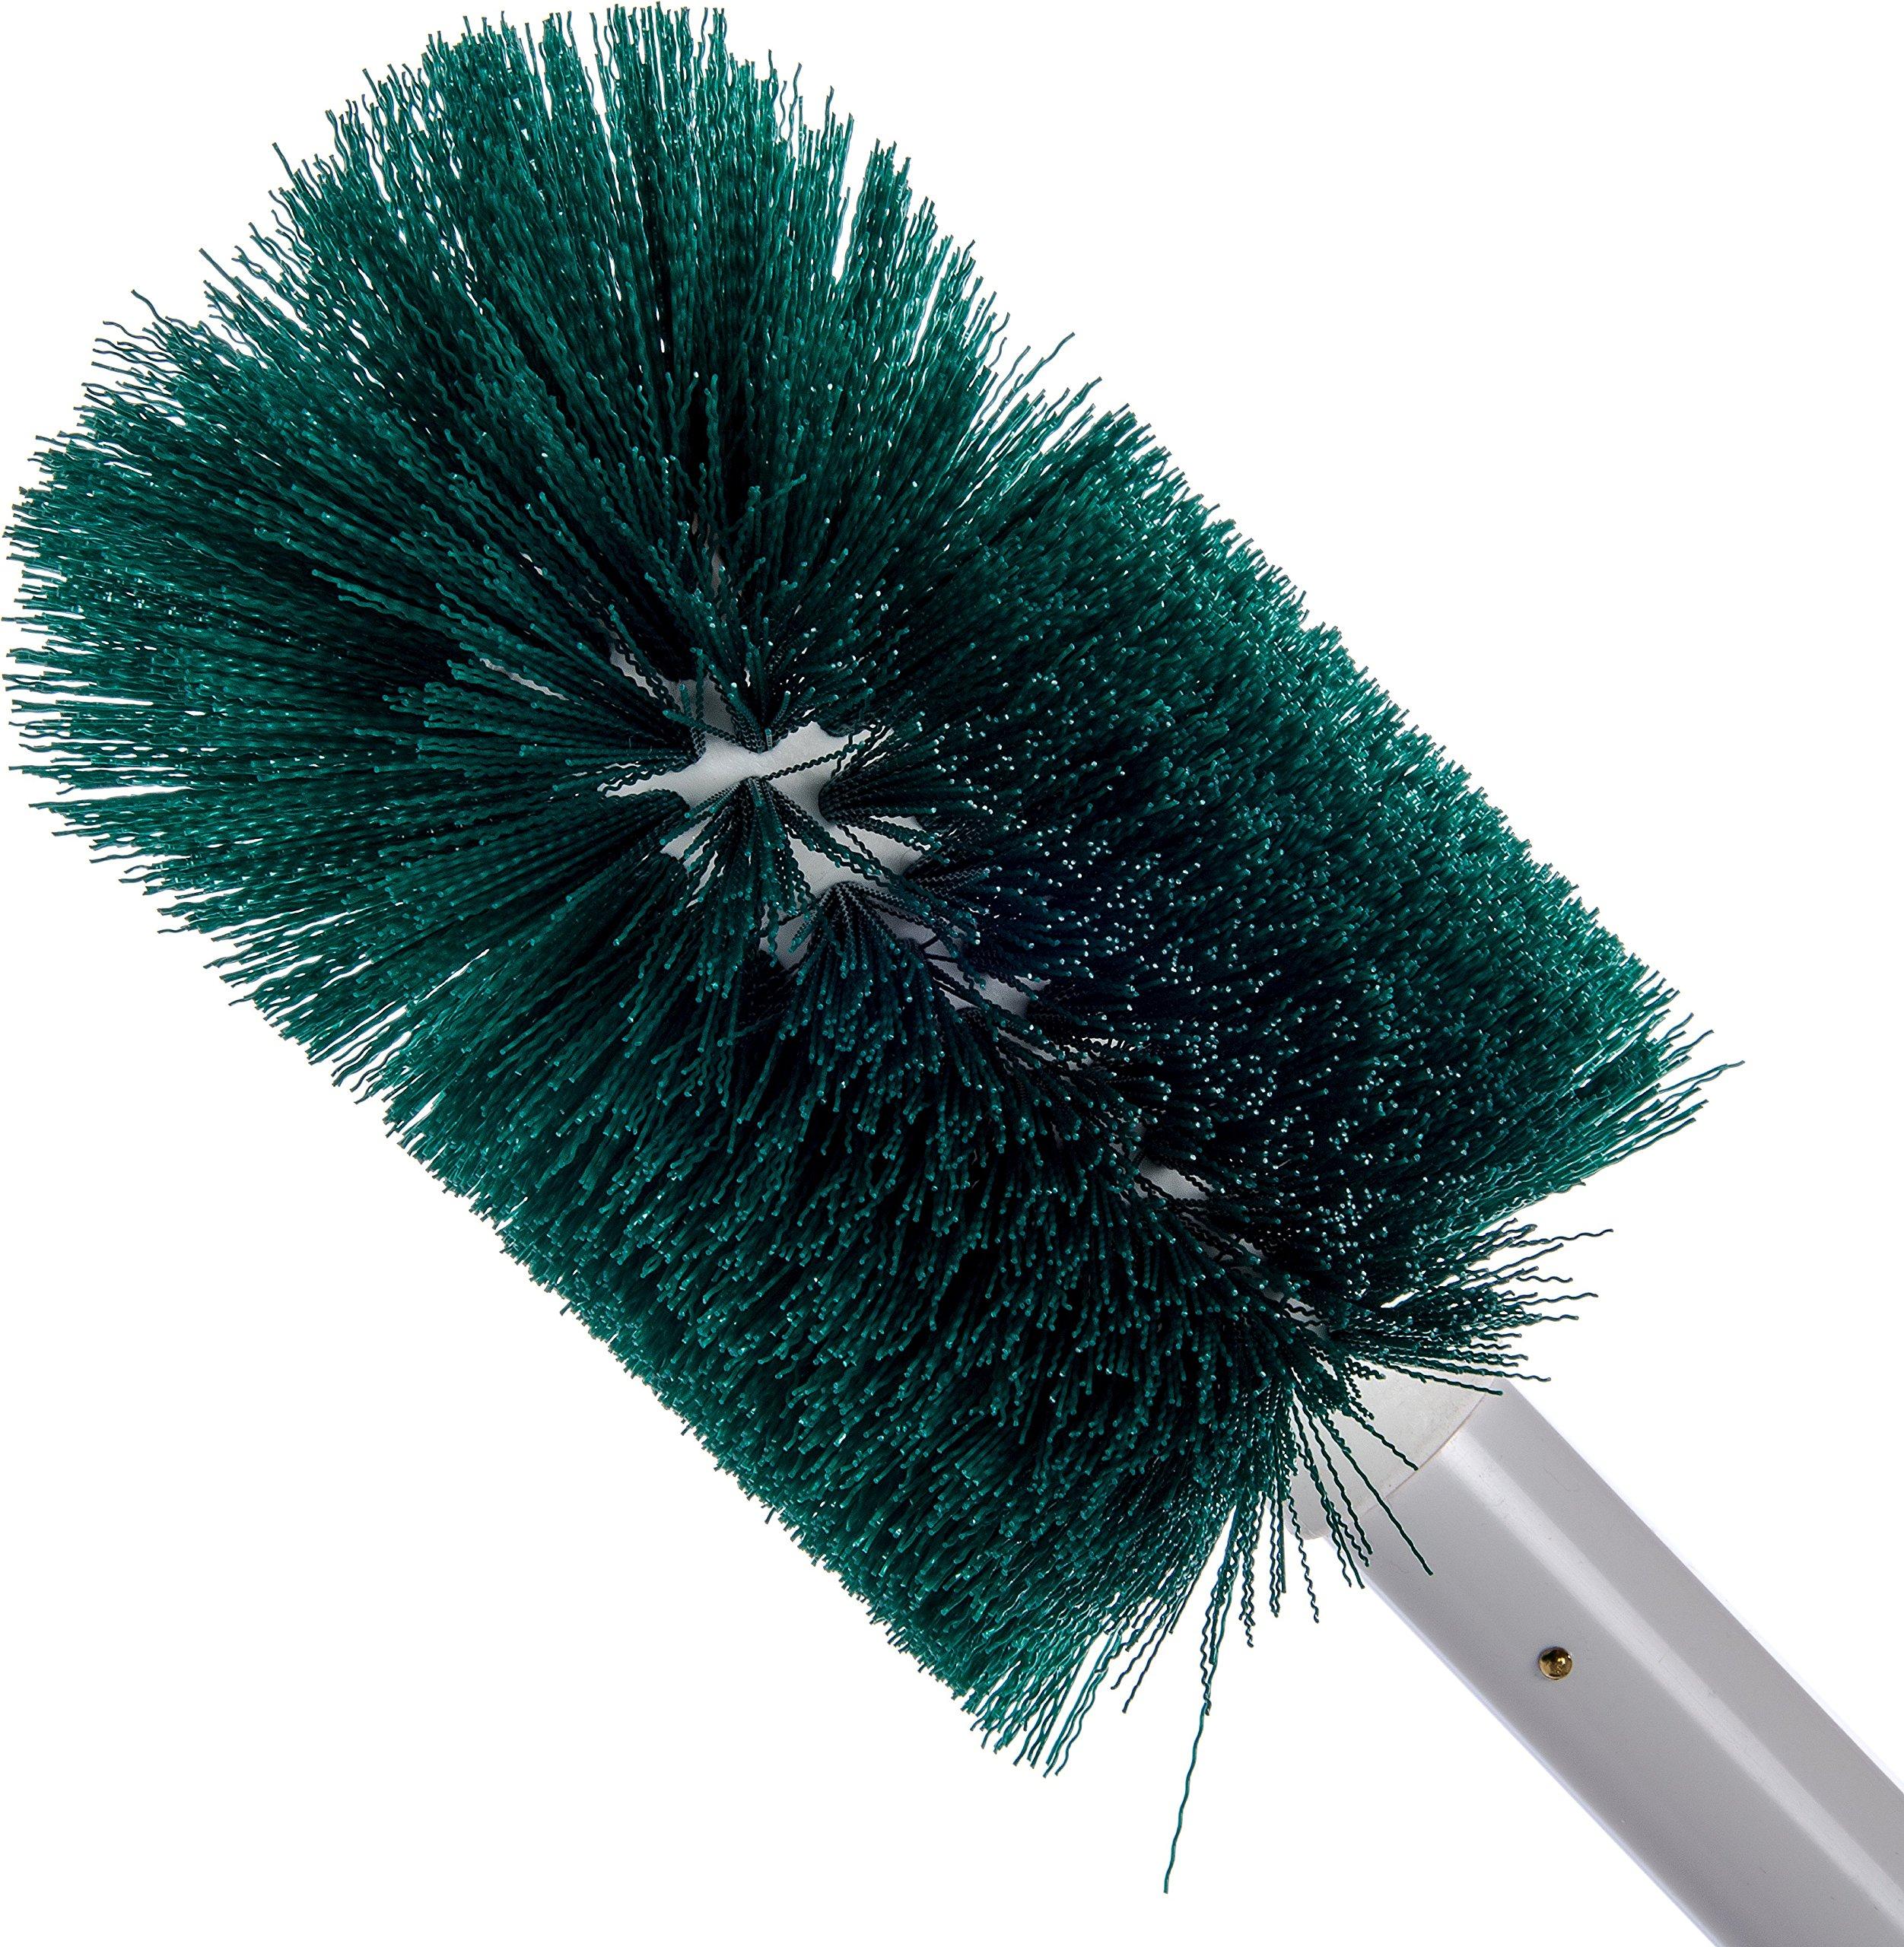 Carlisle 4000309 Multi-Purpose Oval Valve Brush, 3.5'' x 5'' Polyester Bristles, 30'' Length, Green by Carlisle (Image #3)